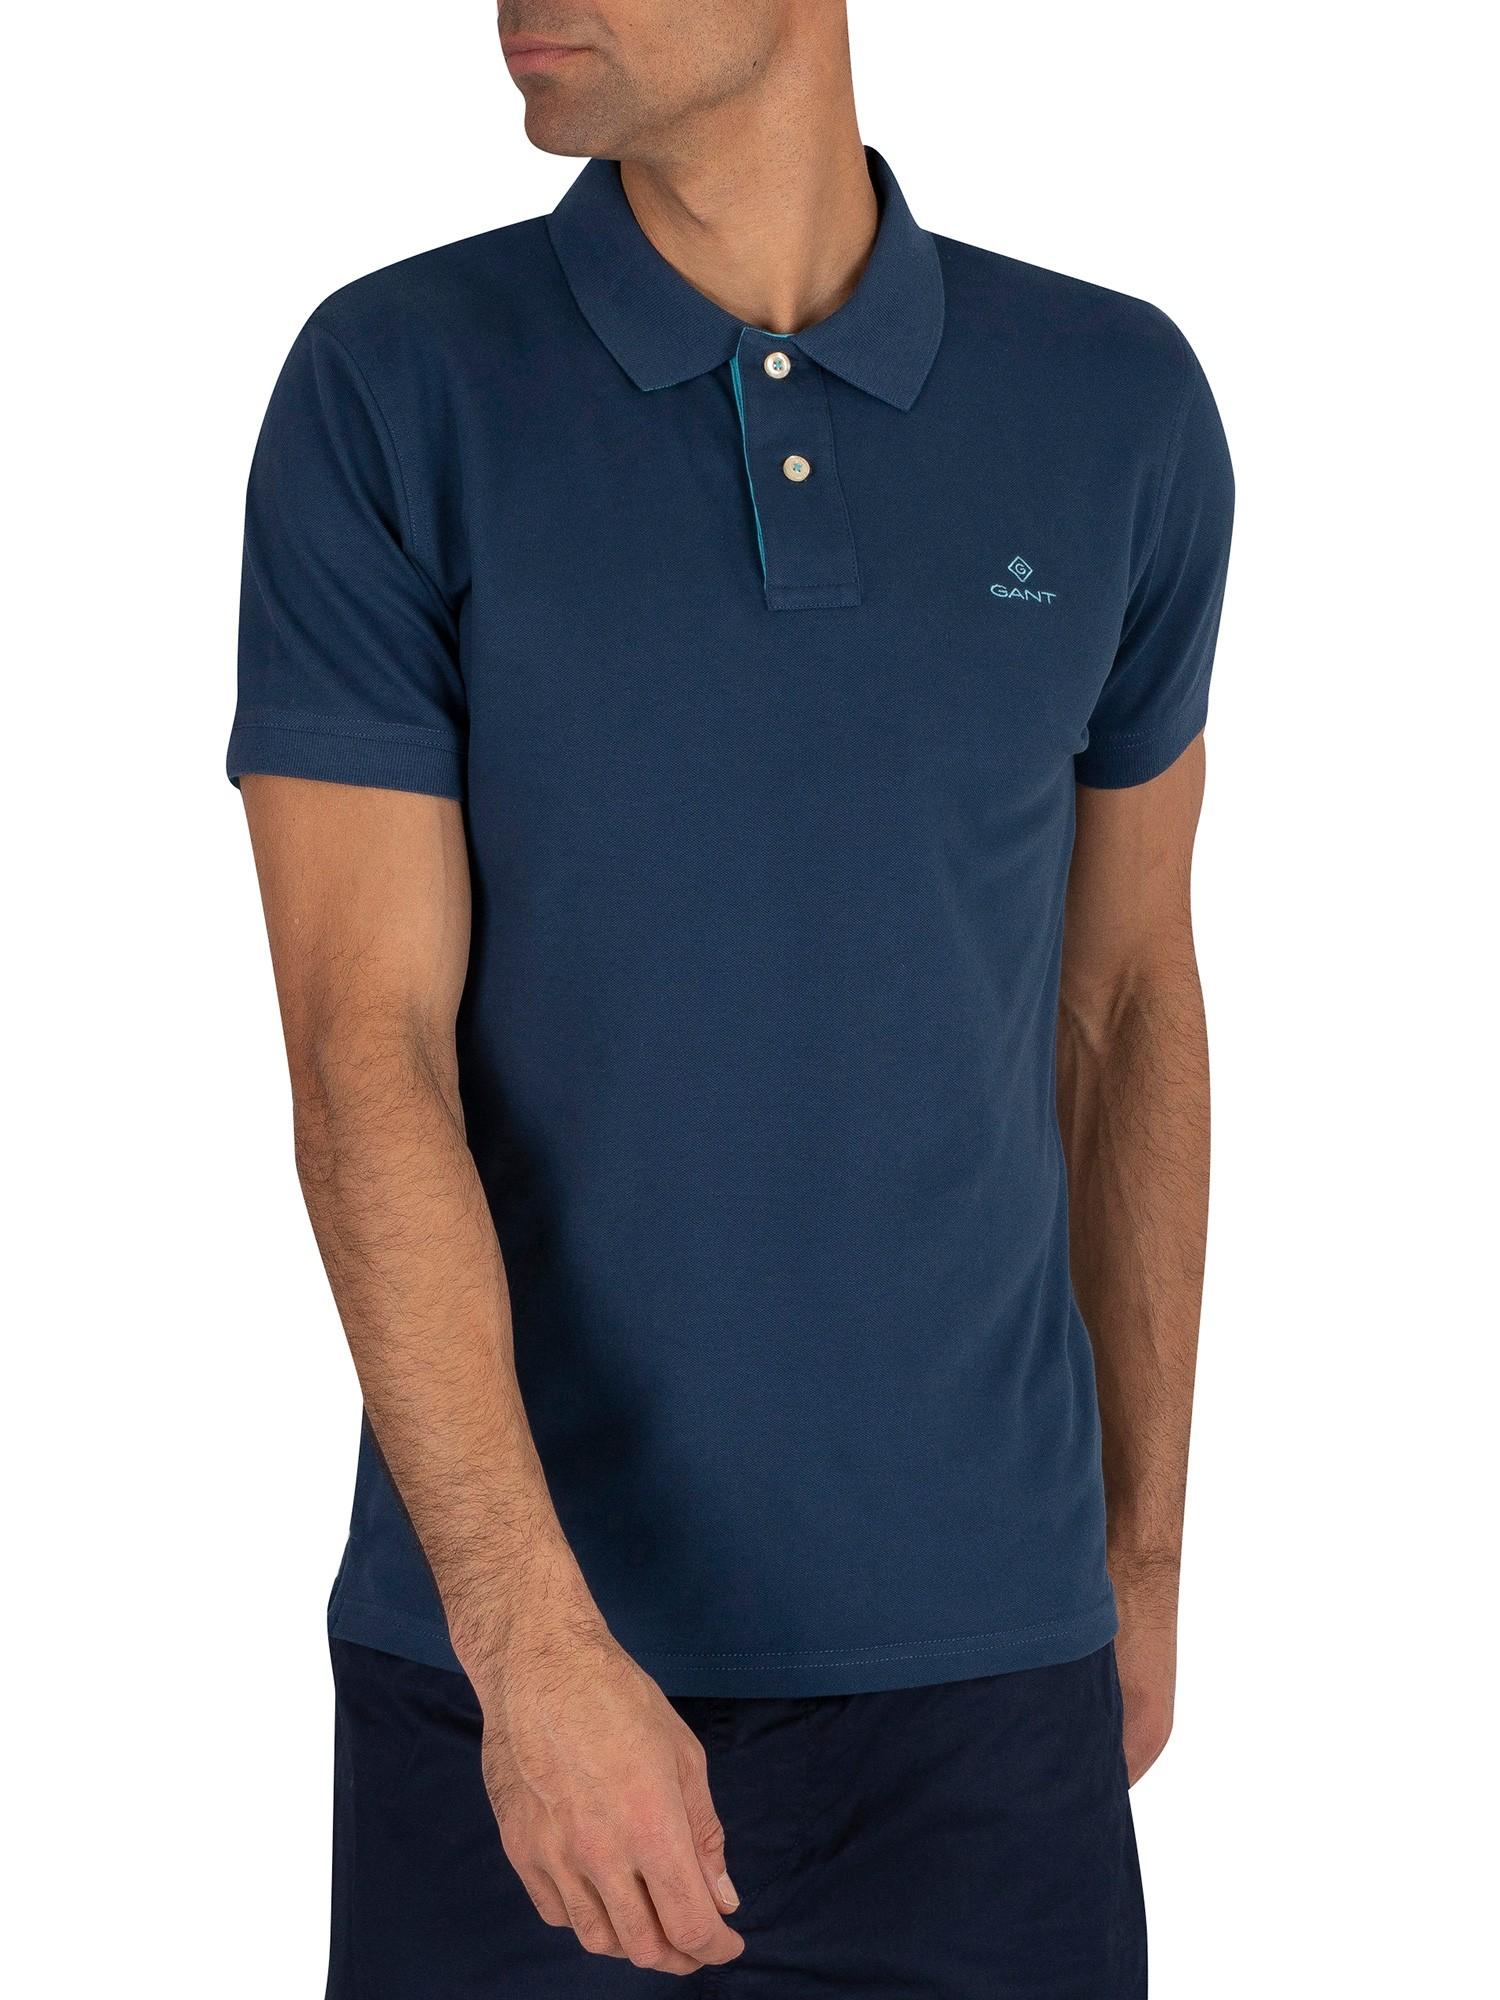 Gant Men/'s Contrast Collar Pique Rugger Poloshirt Blue